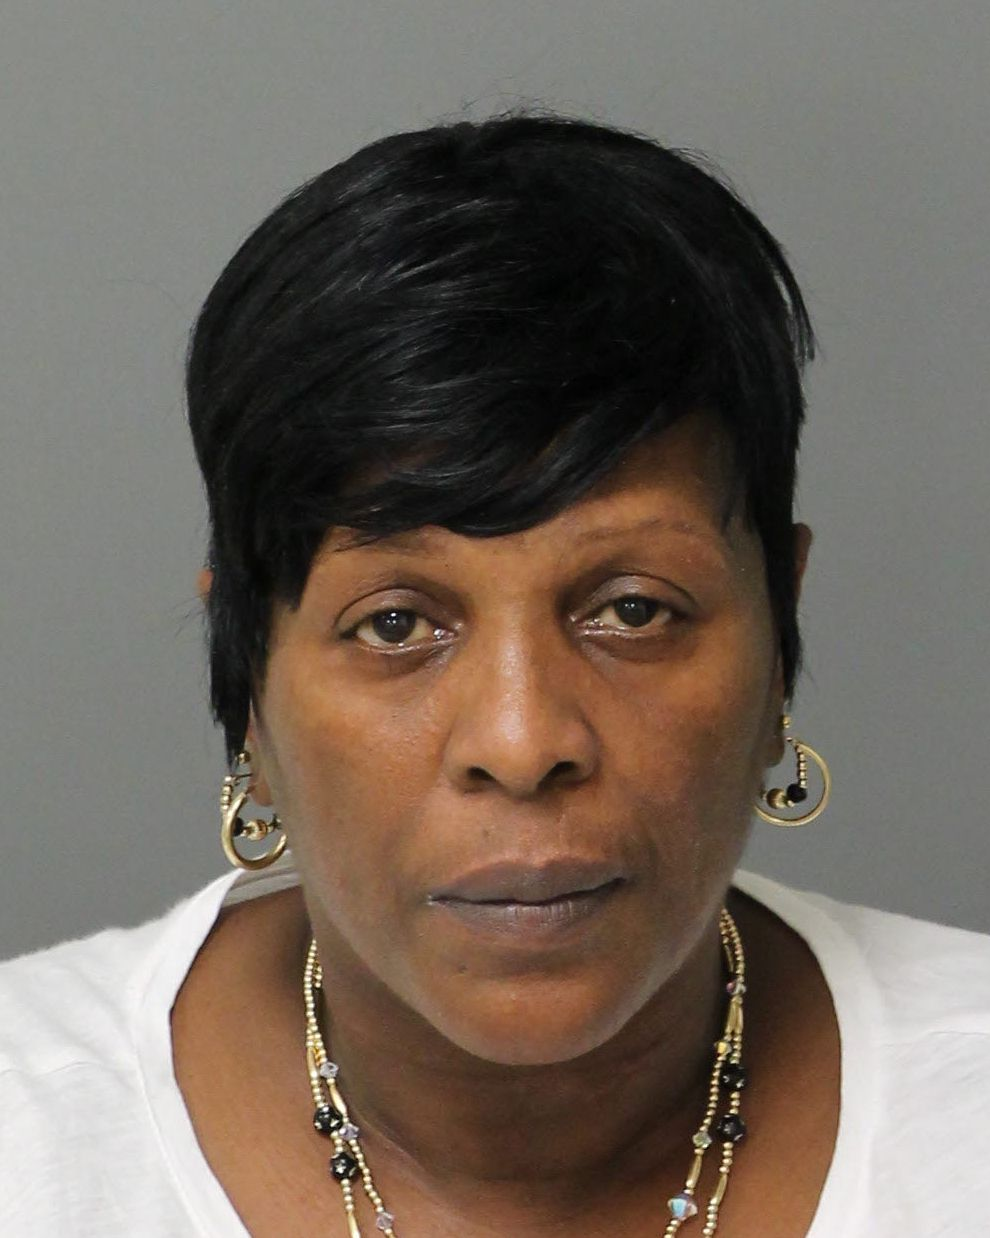 CLARK MARTHA RENEA Mugshot / County Arrests / Wake County Arrests